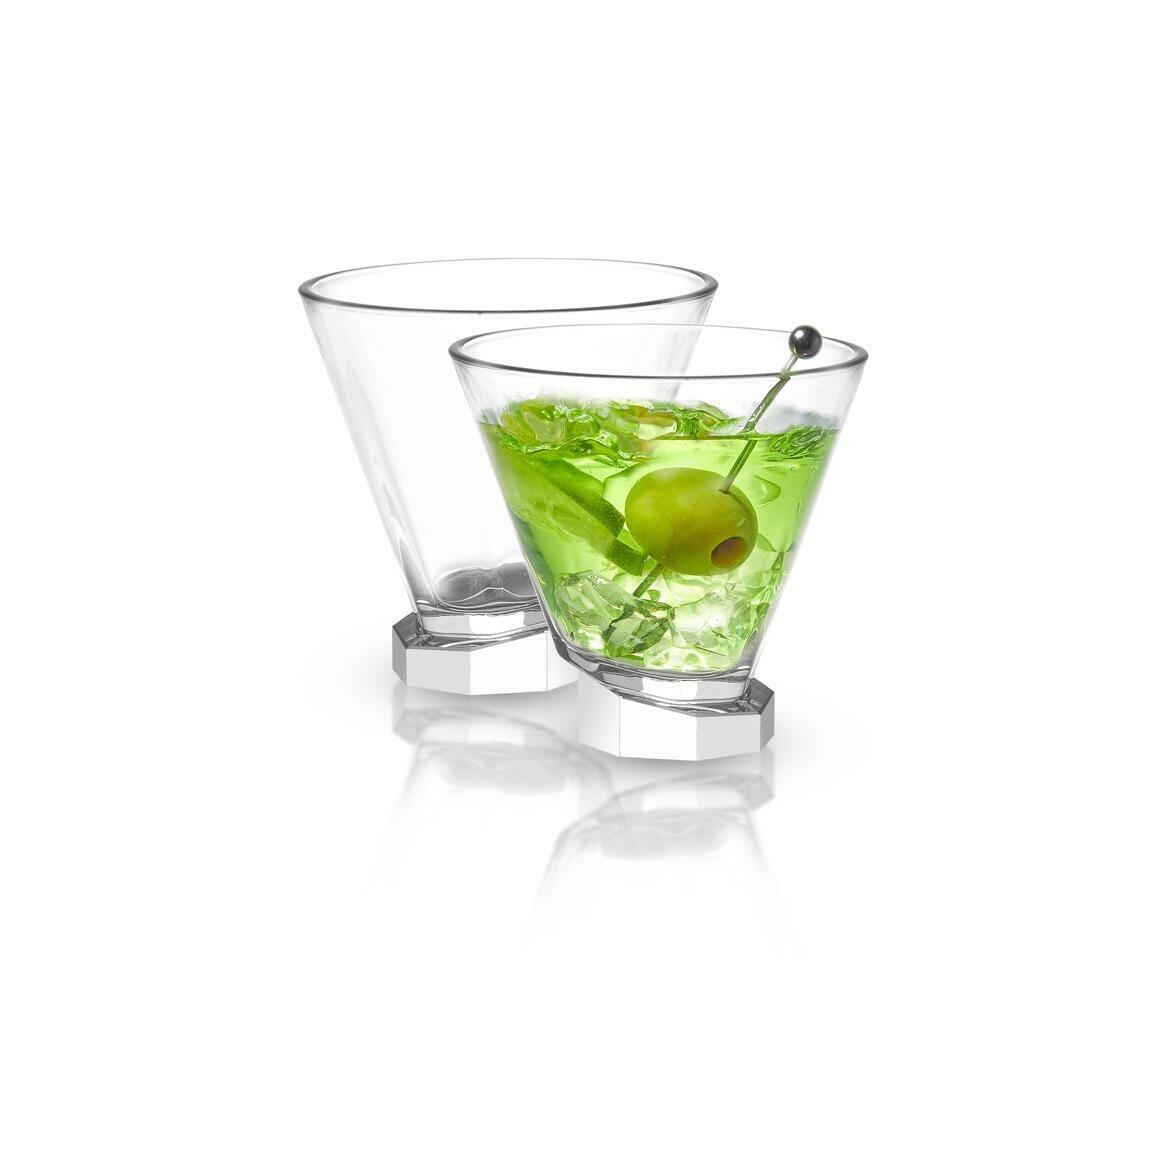 Aqua Vitae Octagon Crystal Martini Glass, 8.1 oz (Set of 2)  | Trada Marketplace